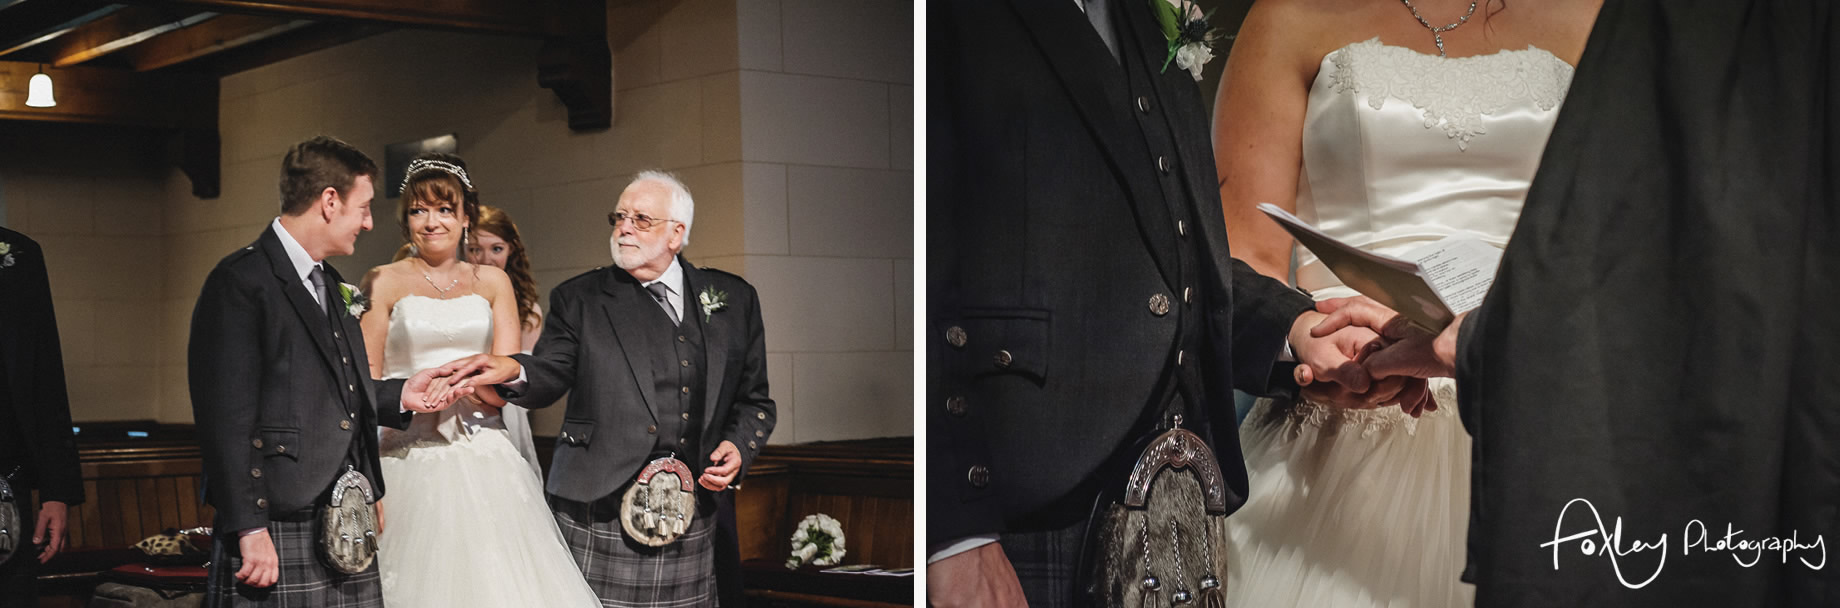 Alys-And-Davids-Wedding-Loch-Lomond-089